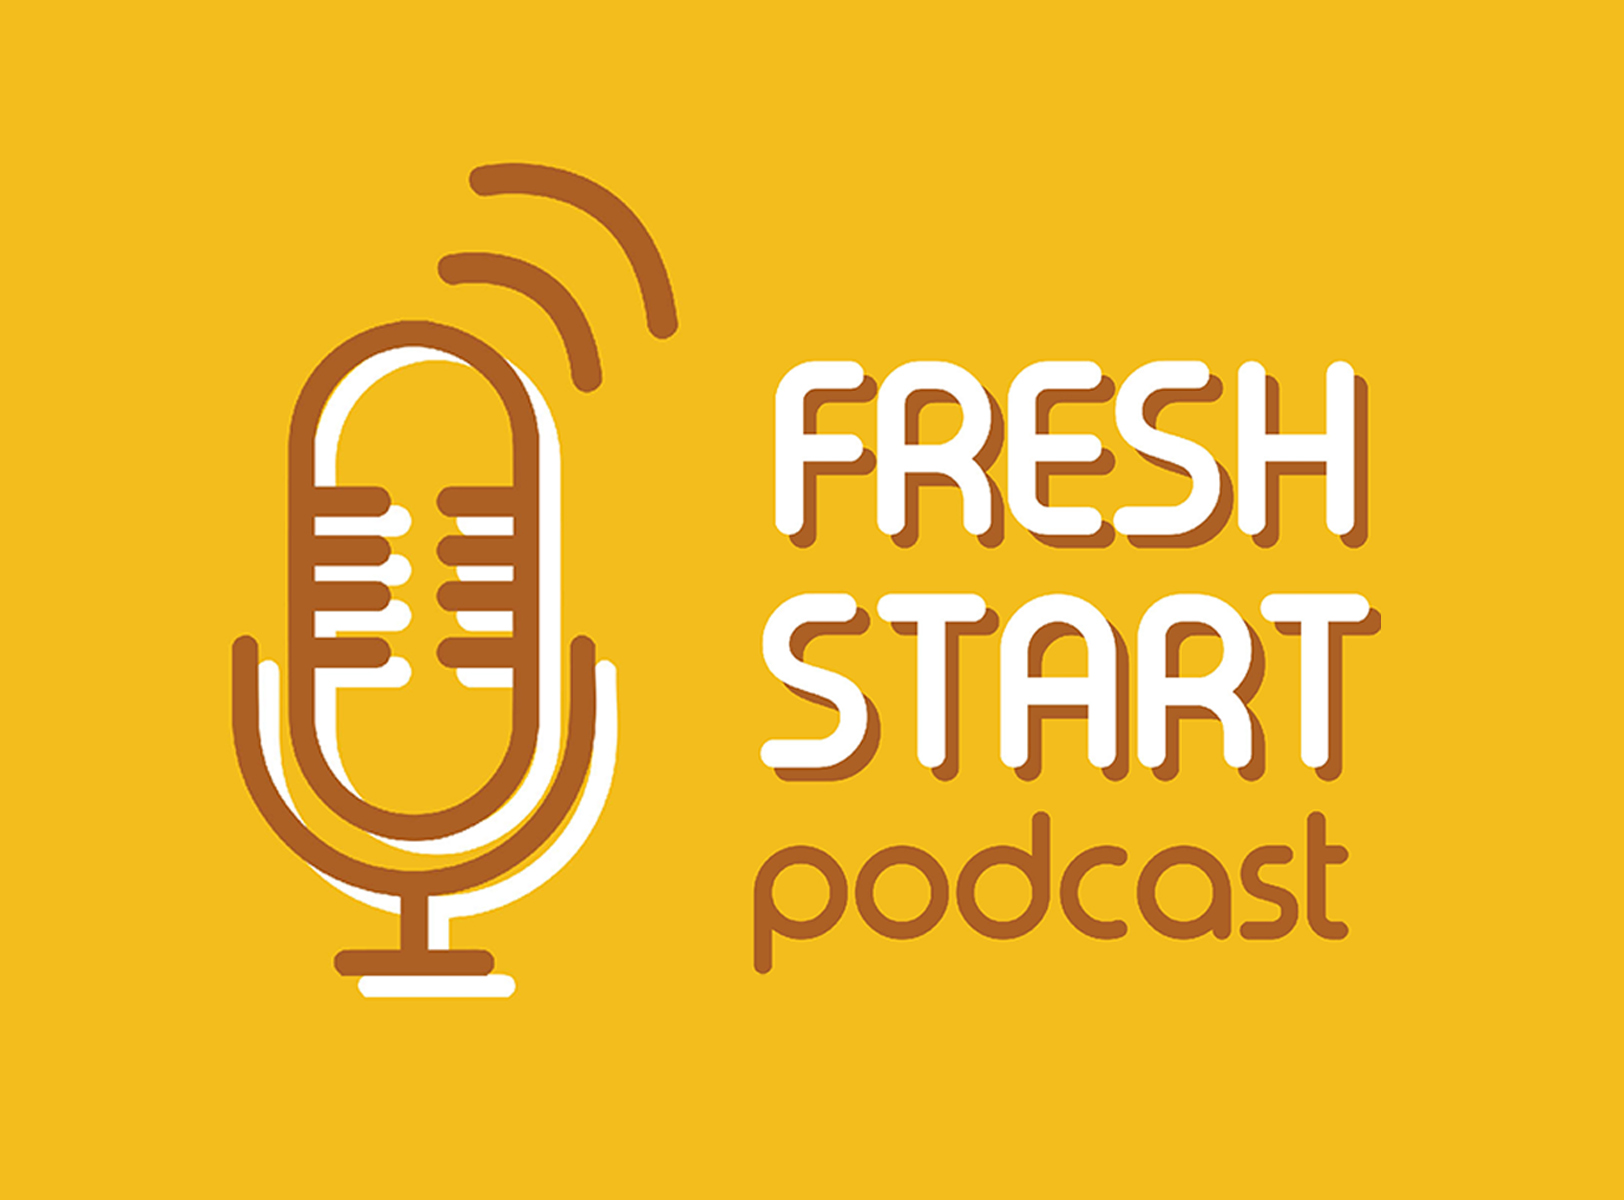 Fresh Start: Podcast News (4/27/2019 Sat.)